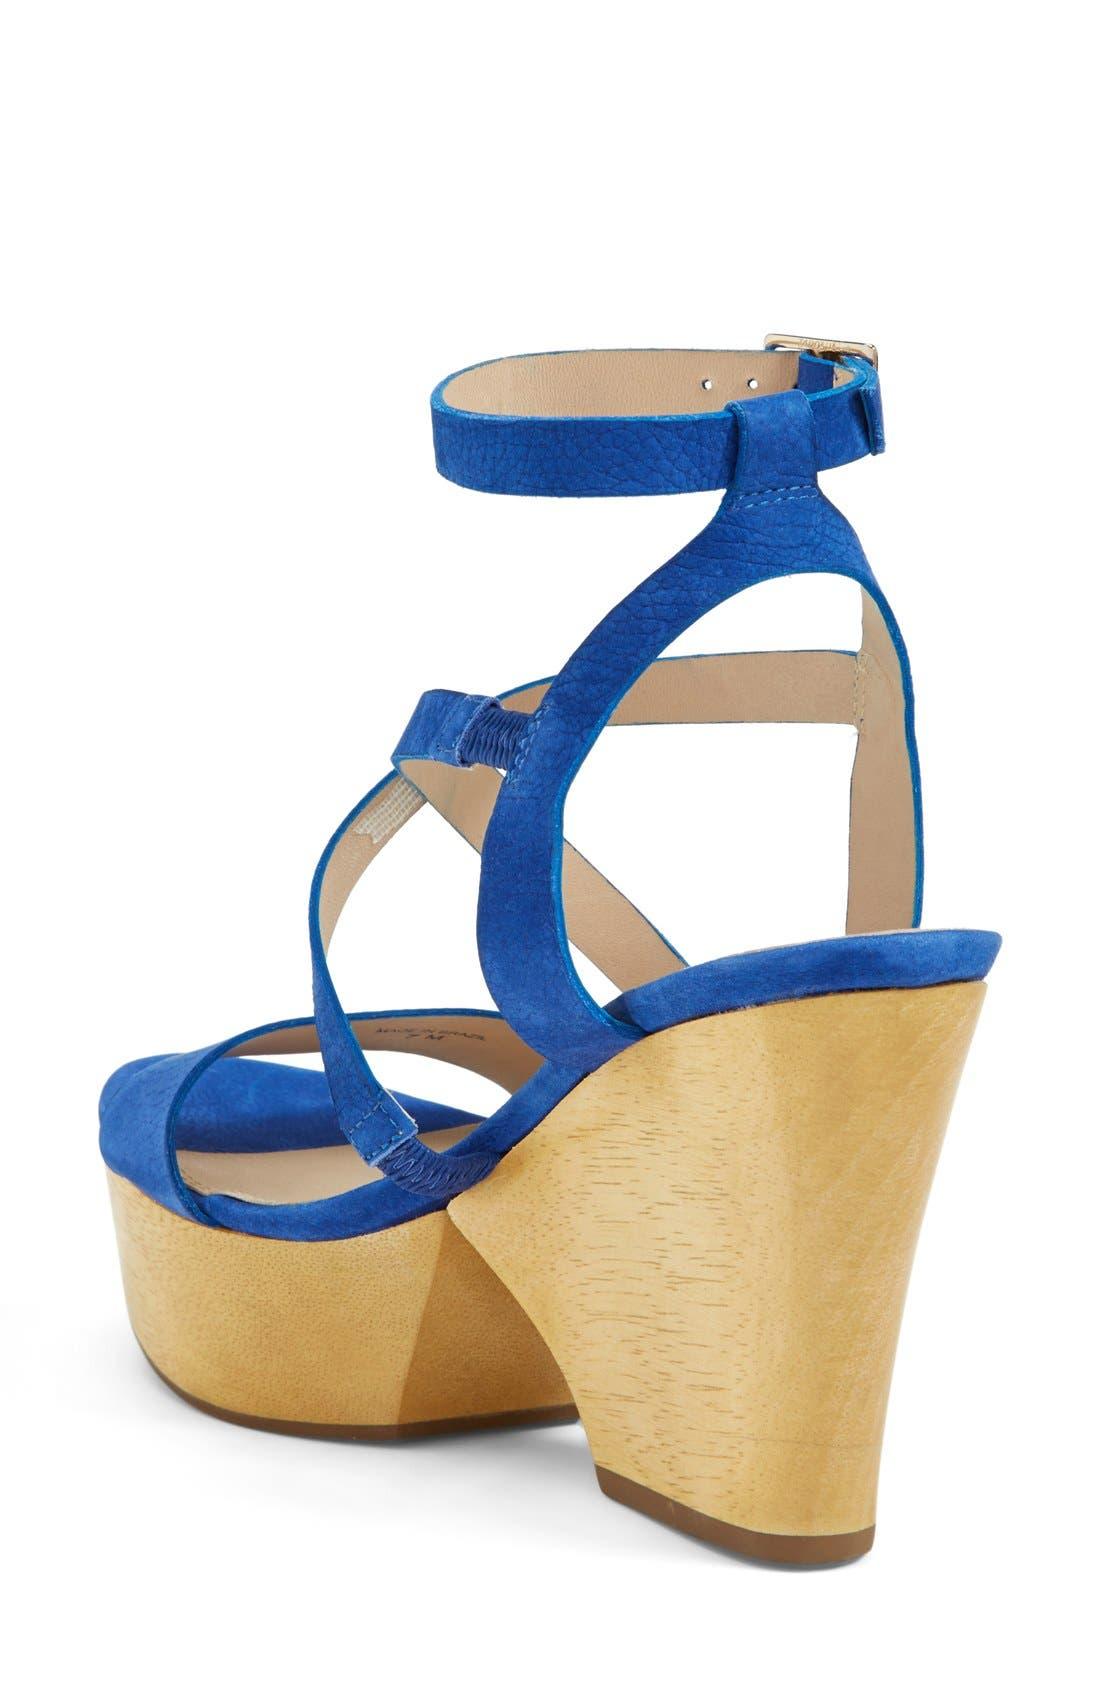 'Lamille' Leather Platform Wedge Sandal,                             Alternate thumbnail 2, color,                             Blue Riviera